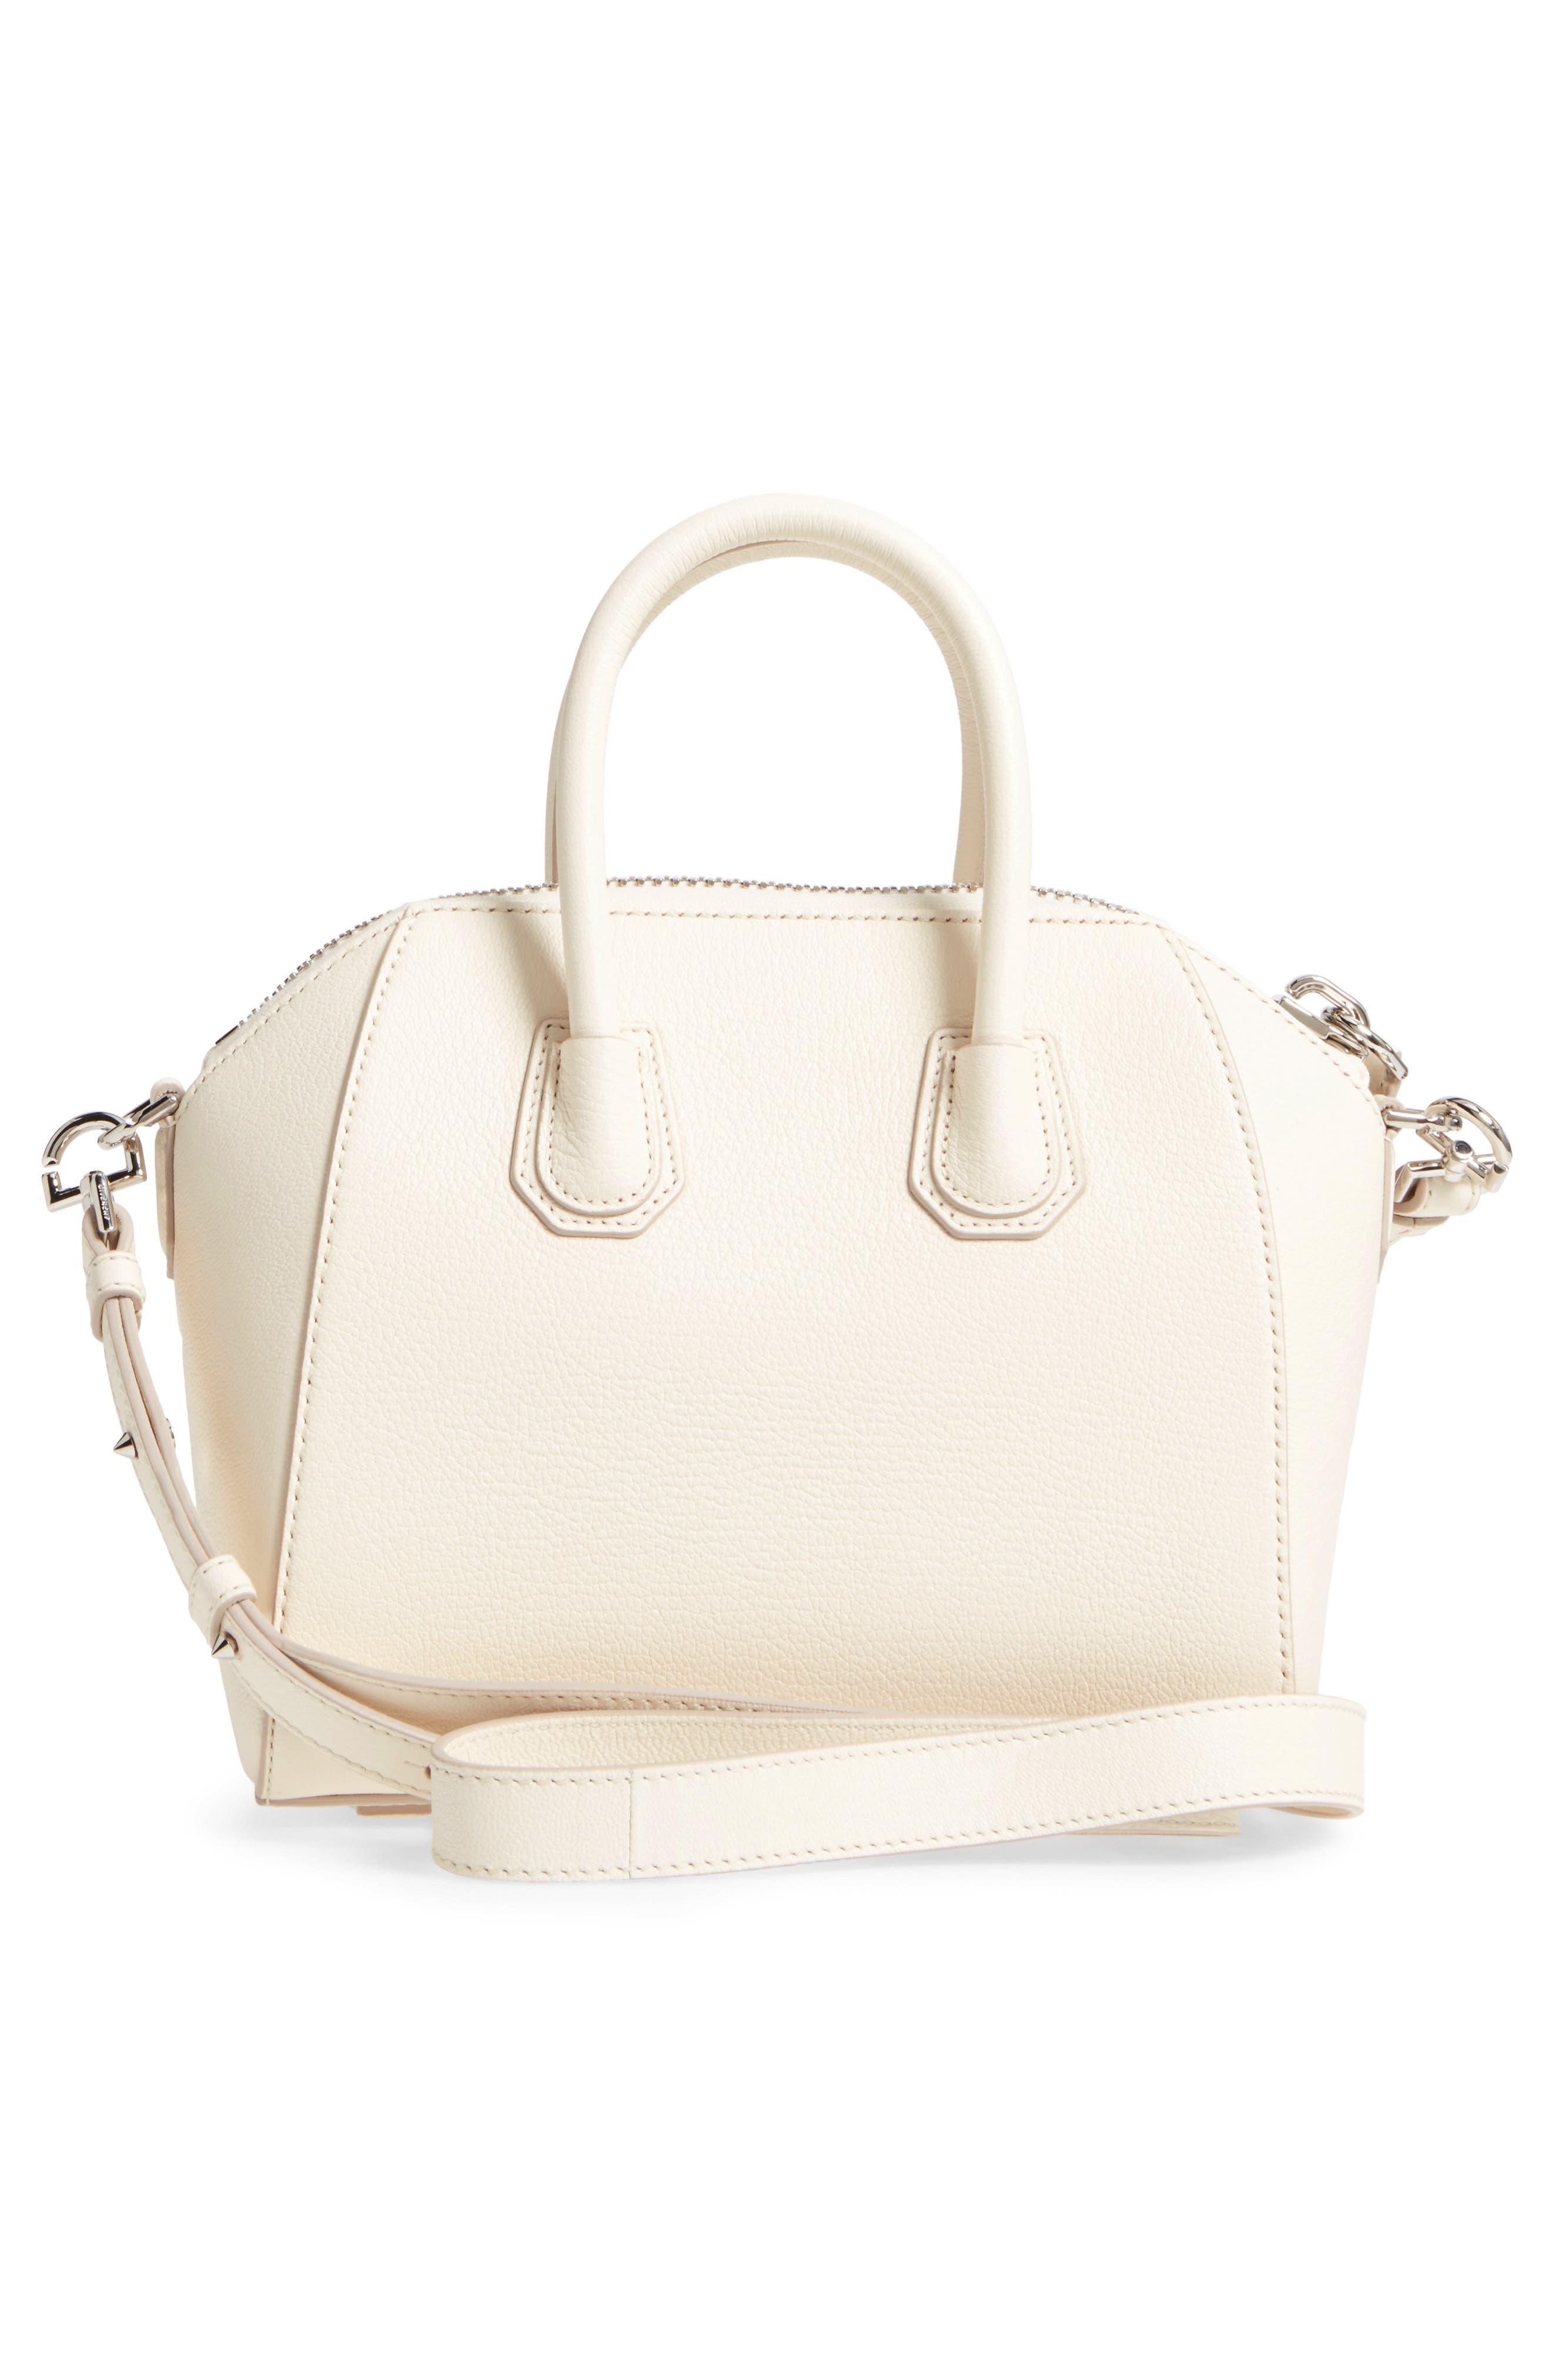 Alternate Image 3  - Givenchy 'Mini Antigona' Sugar Leather Satchel